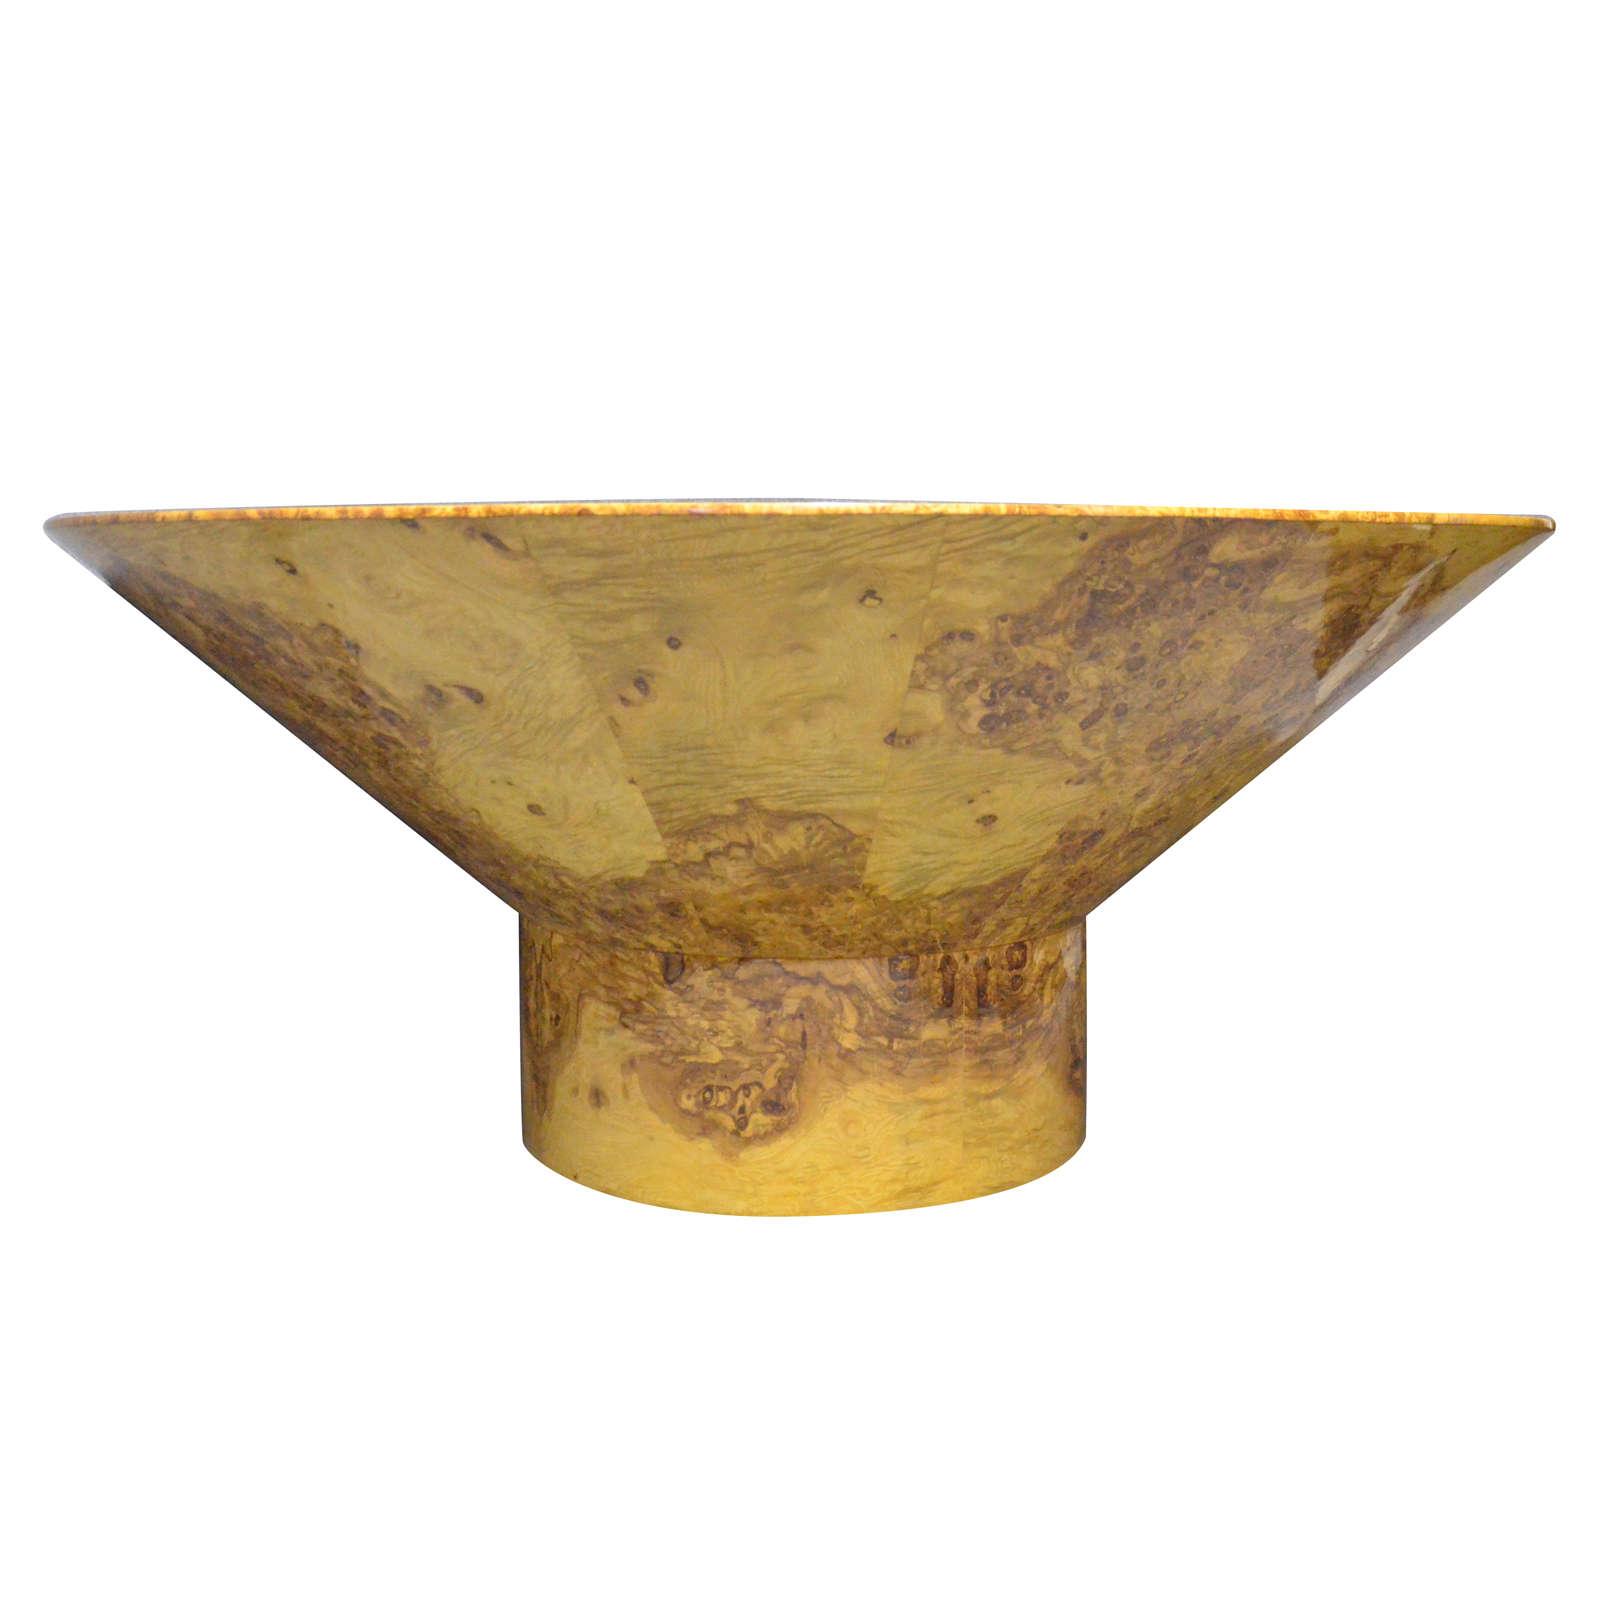 1920s Round Olive Burl Wood Table Art Deco